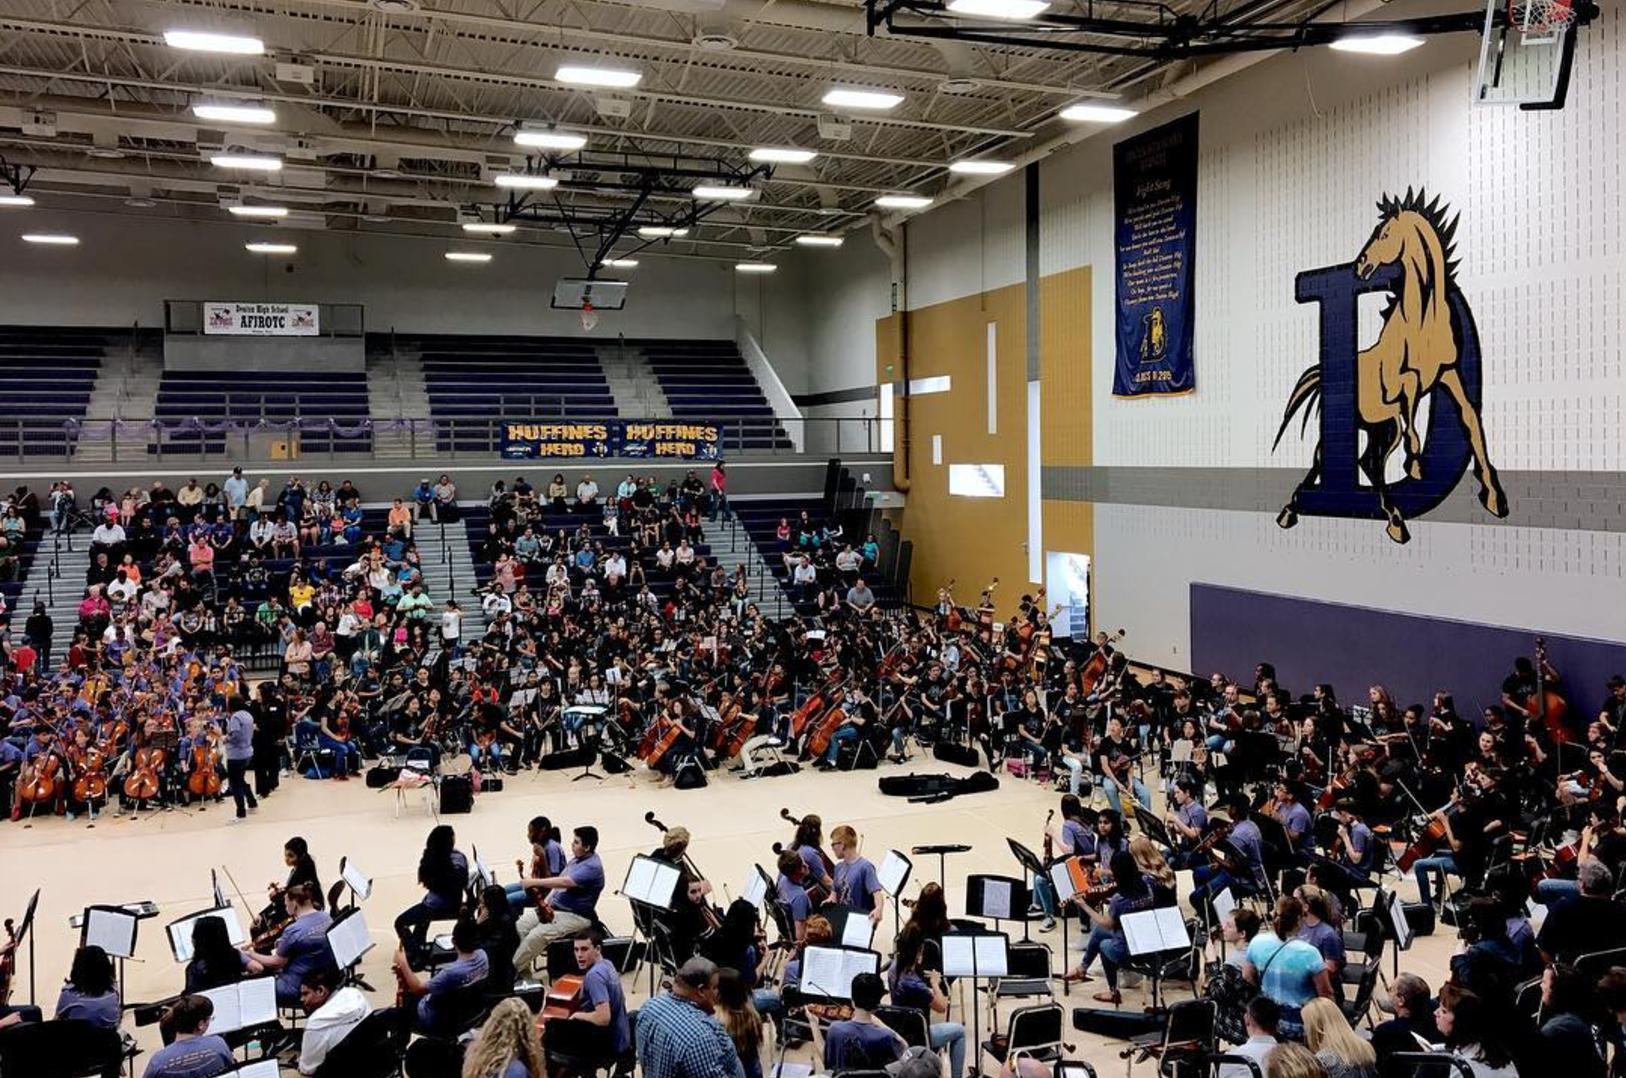 String Fling at Denton High School. Photo by @kkendrickbigley.